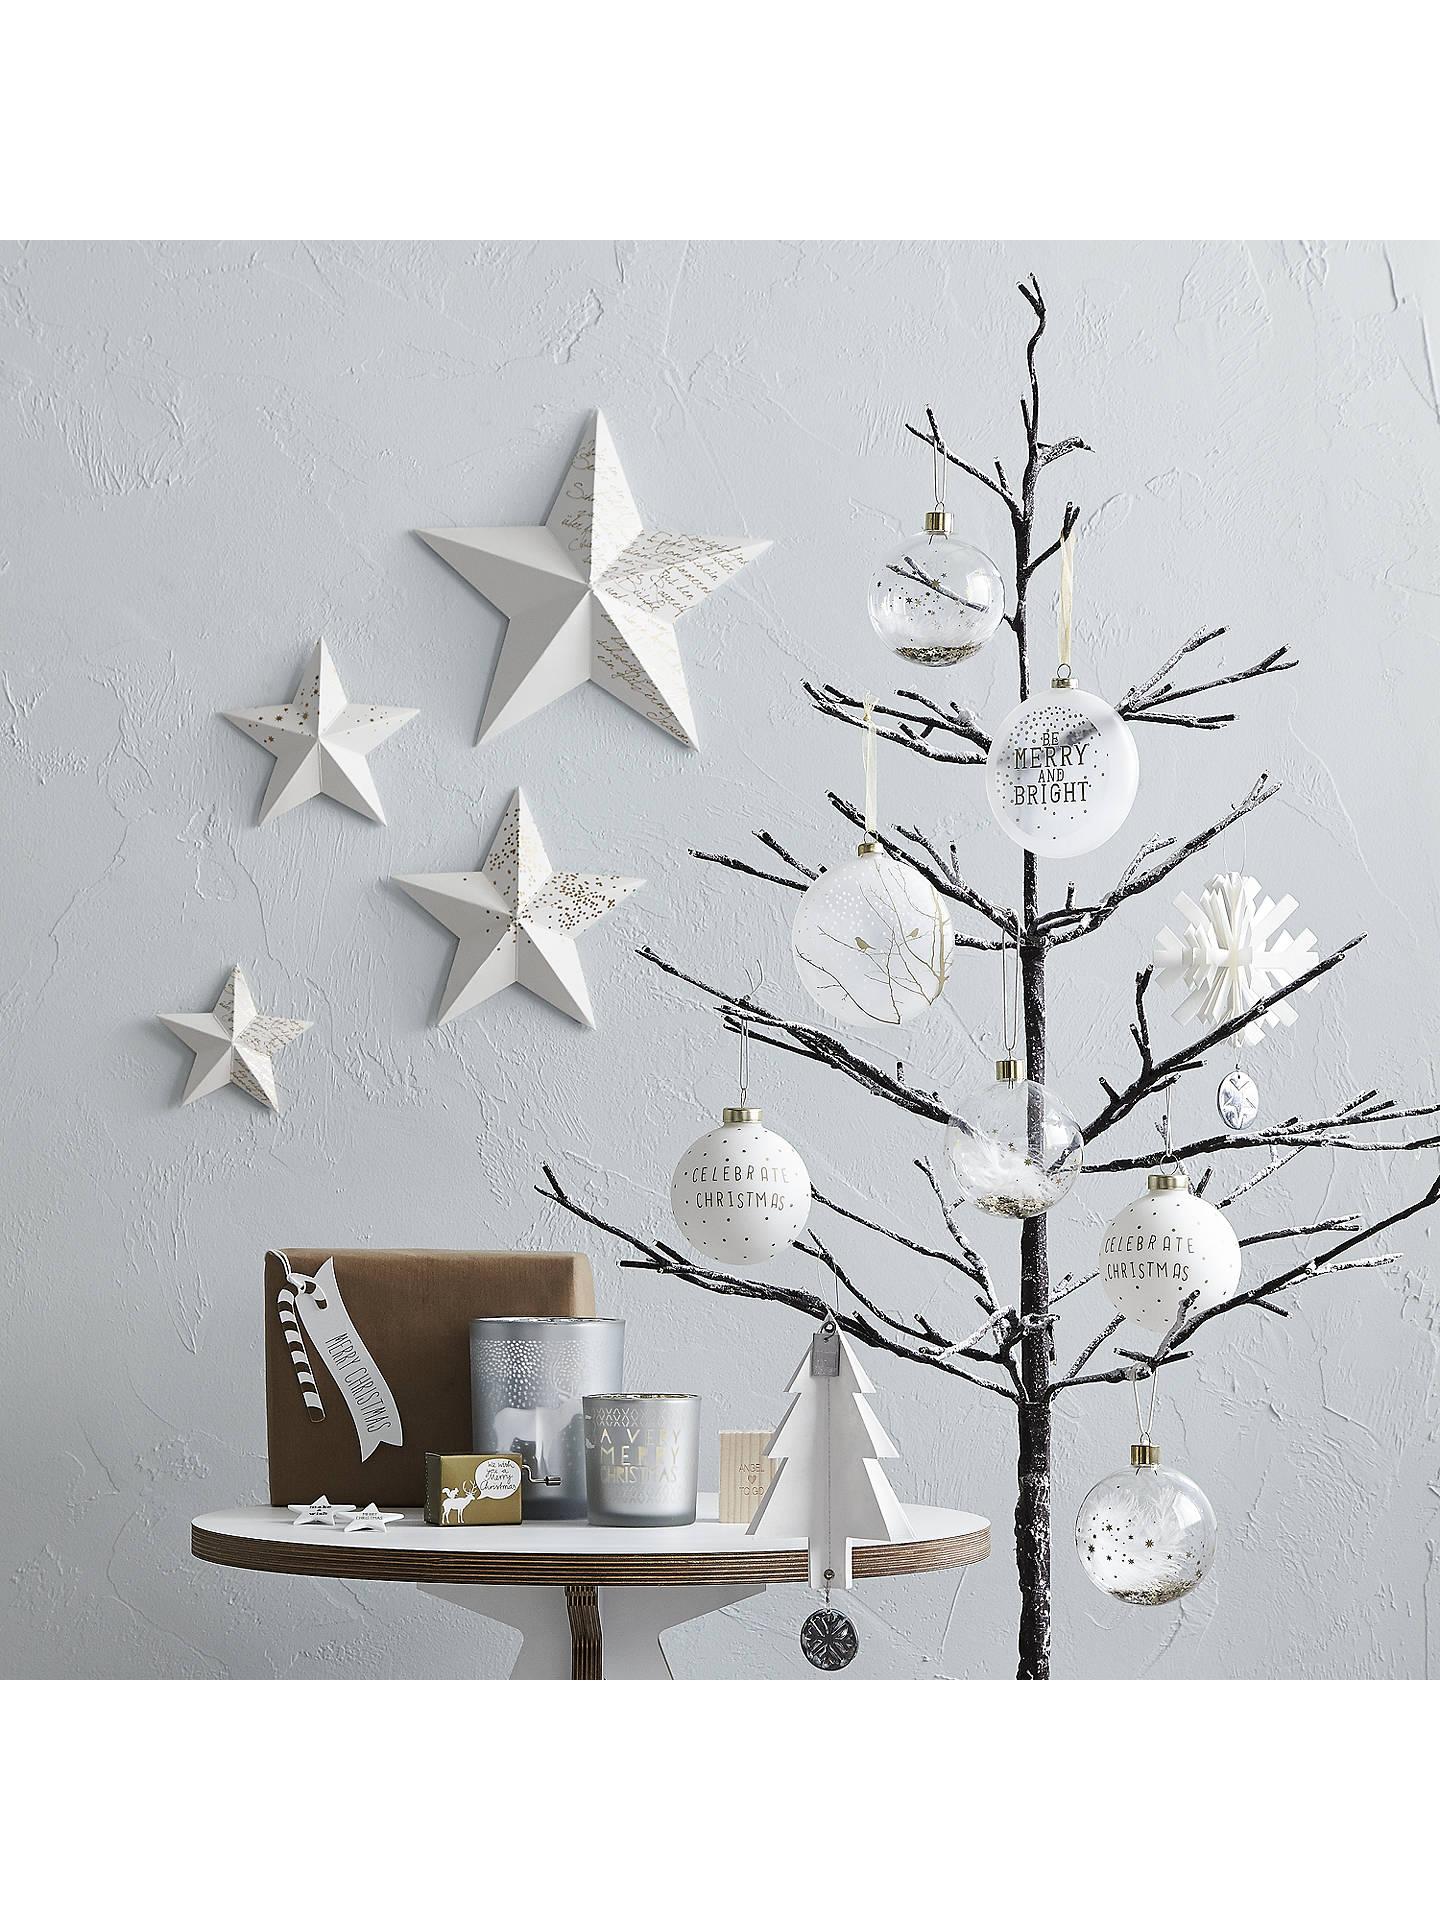 John Lewis 6ft Pre-Lit Snowy Twig Christmas Tree, White at John Lewis & Partners